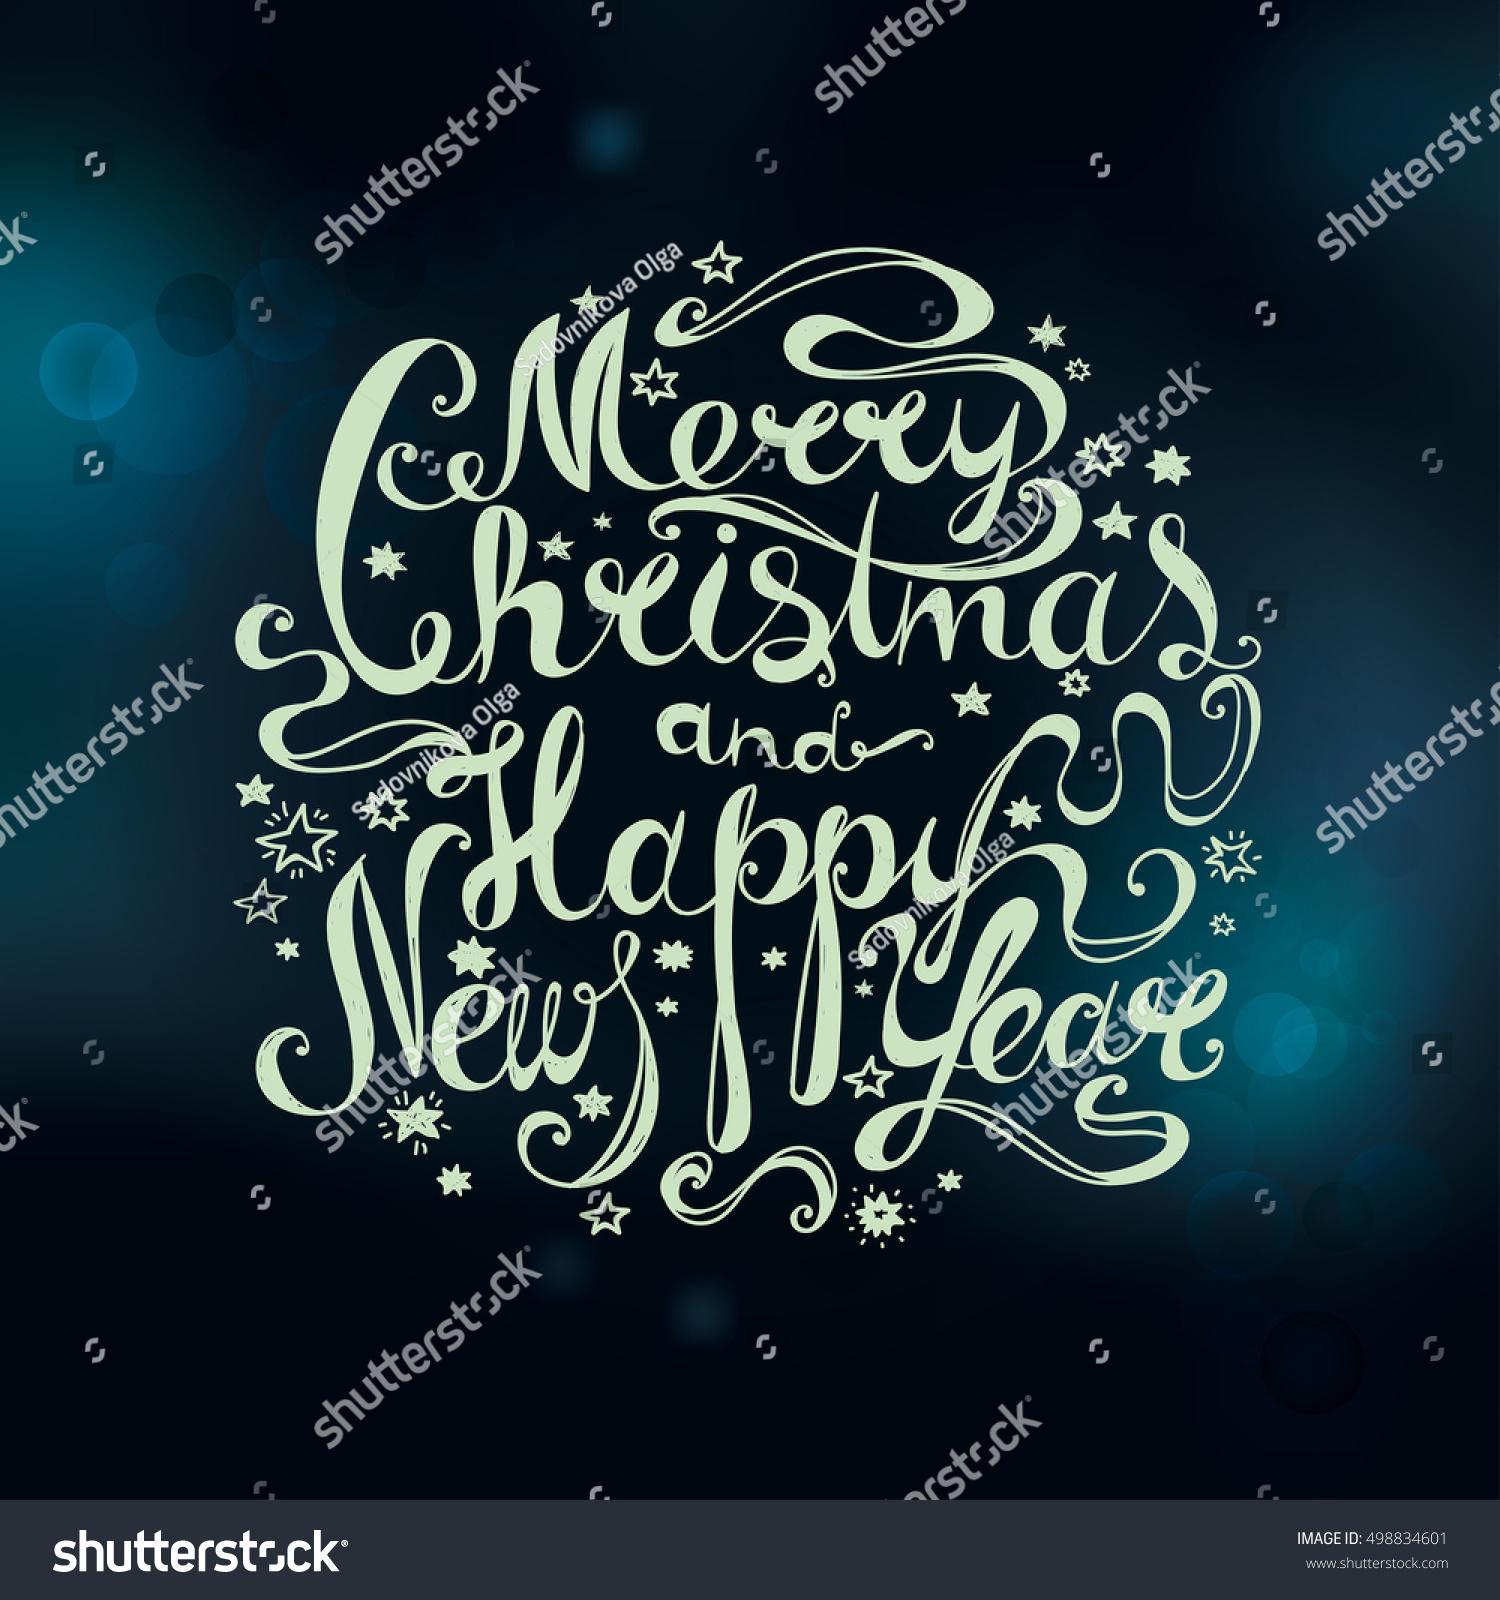 Lettering Merry Christmas Happy New Year Stock-Vektorgrafik ...